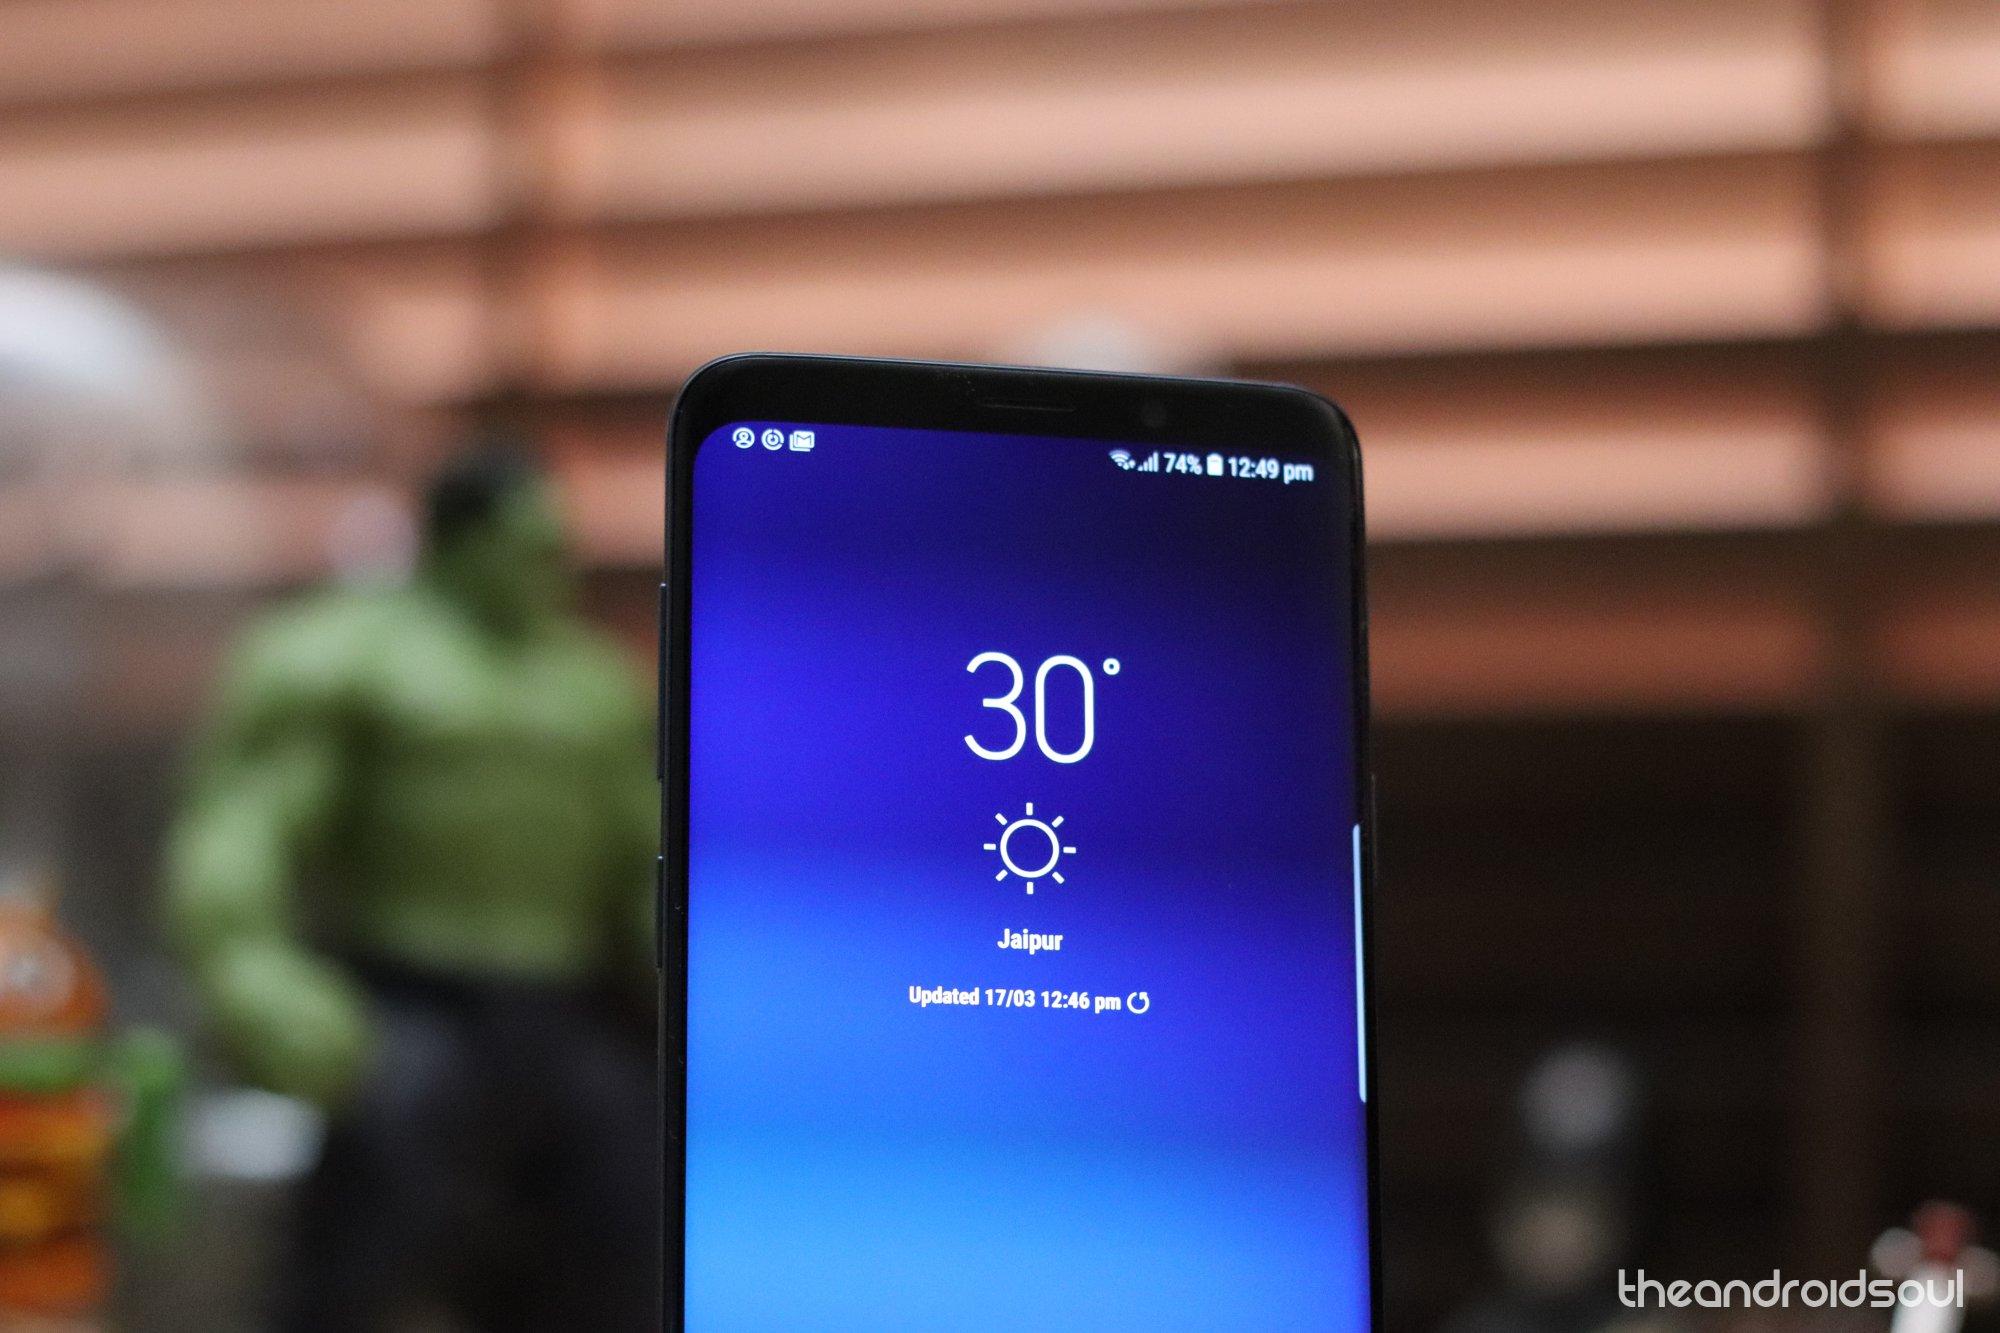 Galaxy S9 smartphone